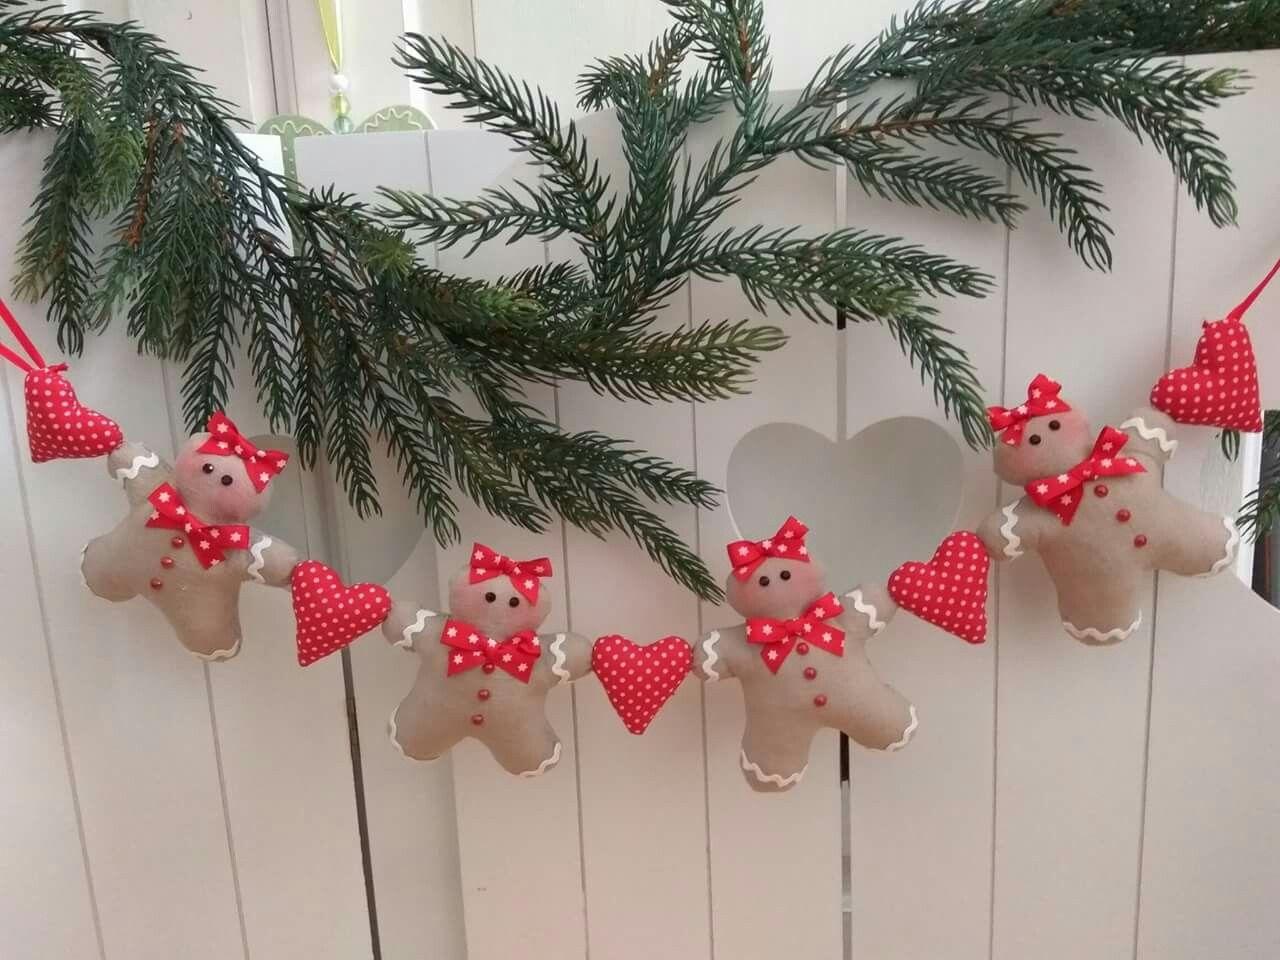 Pin von Erika auf Kreatív Karácsony